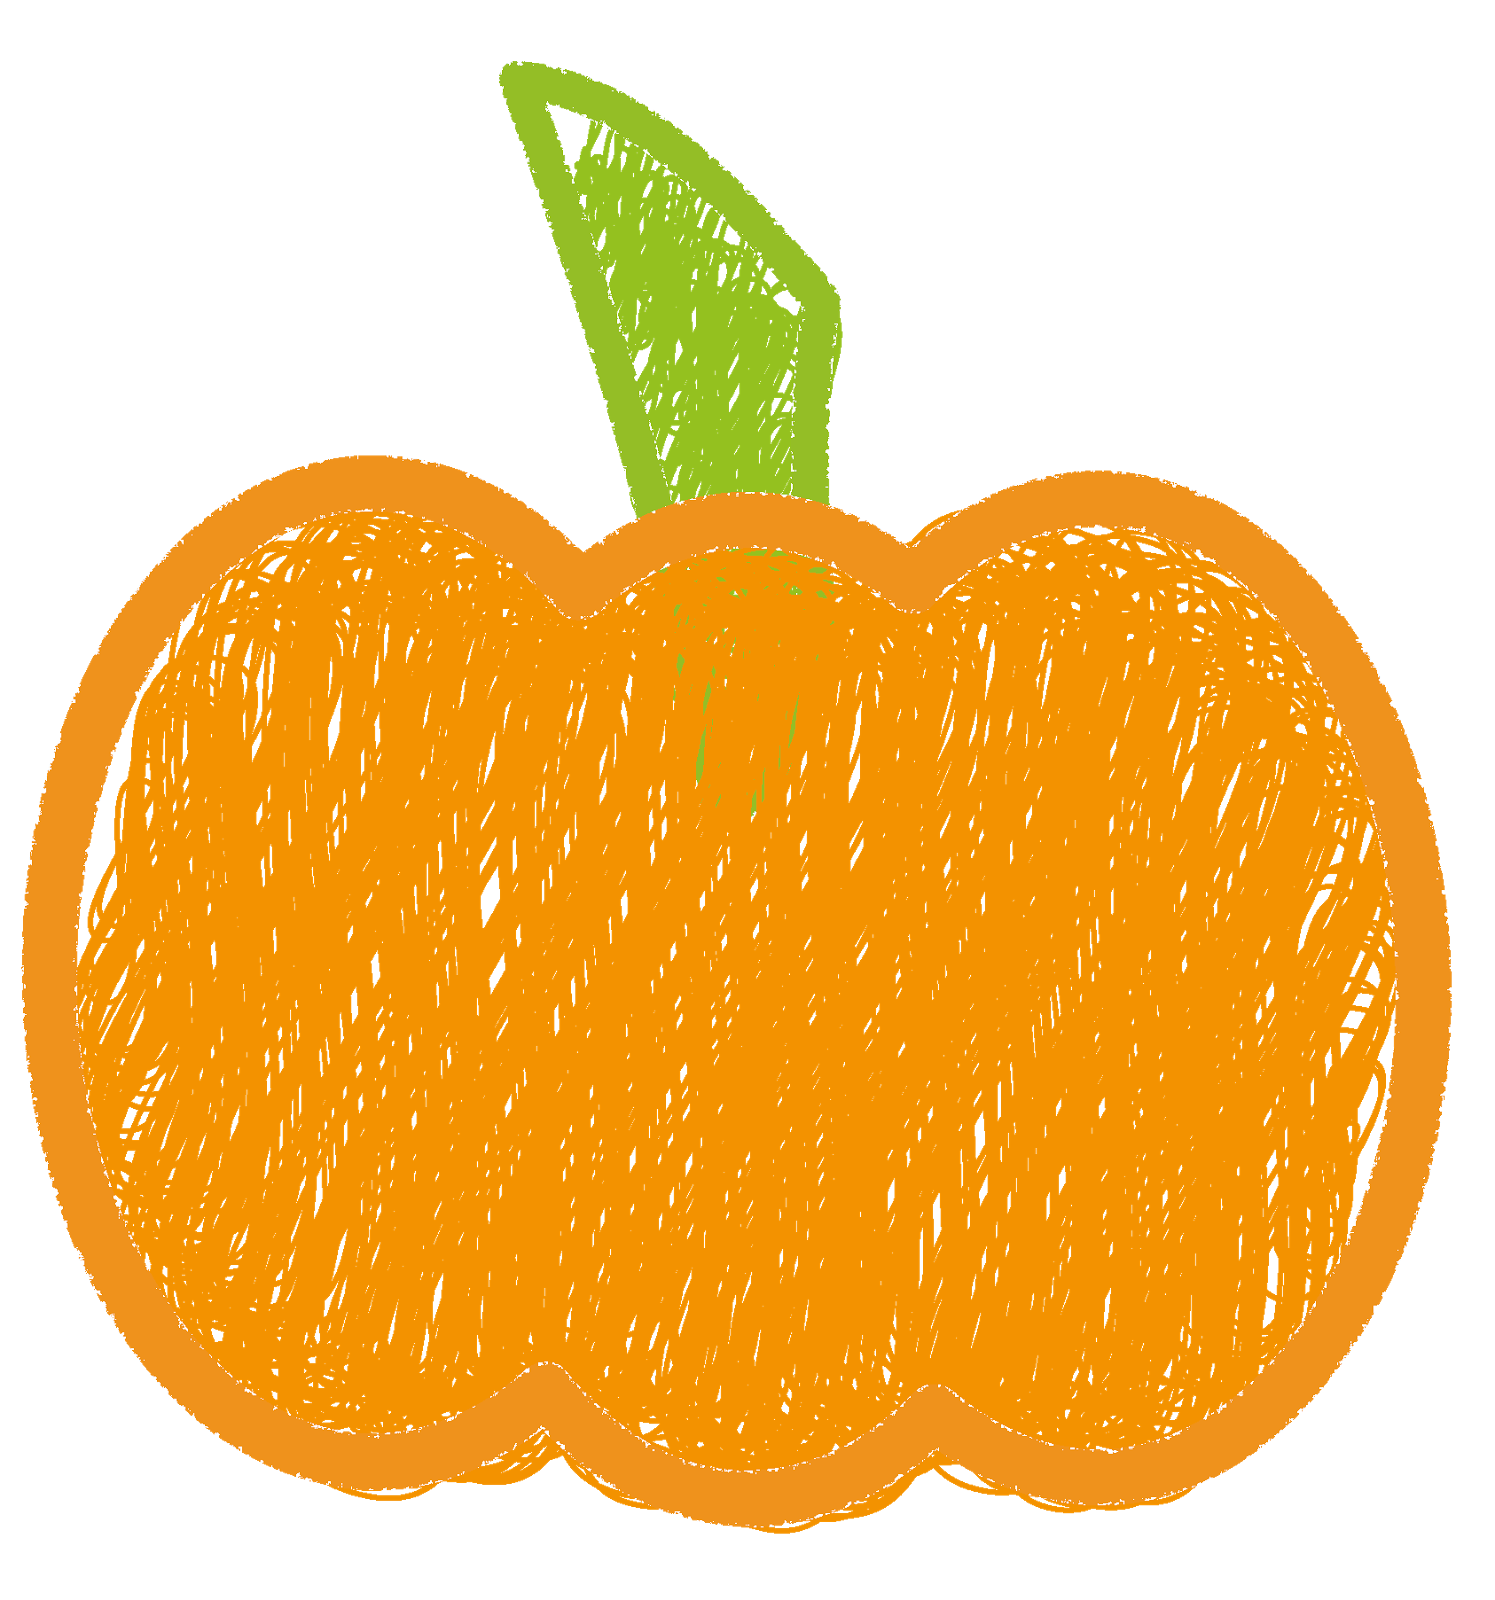 Pumpkin stem image clipart vector freeuse library Pumpkin Cousins: An AIMS Activity Freebie - STEM is Elementary vector freeuse library